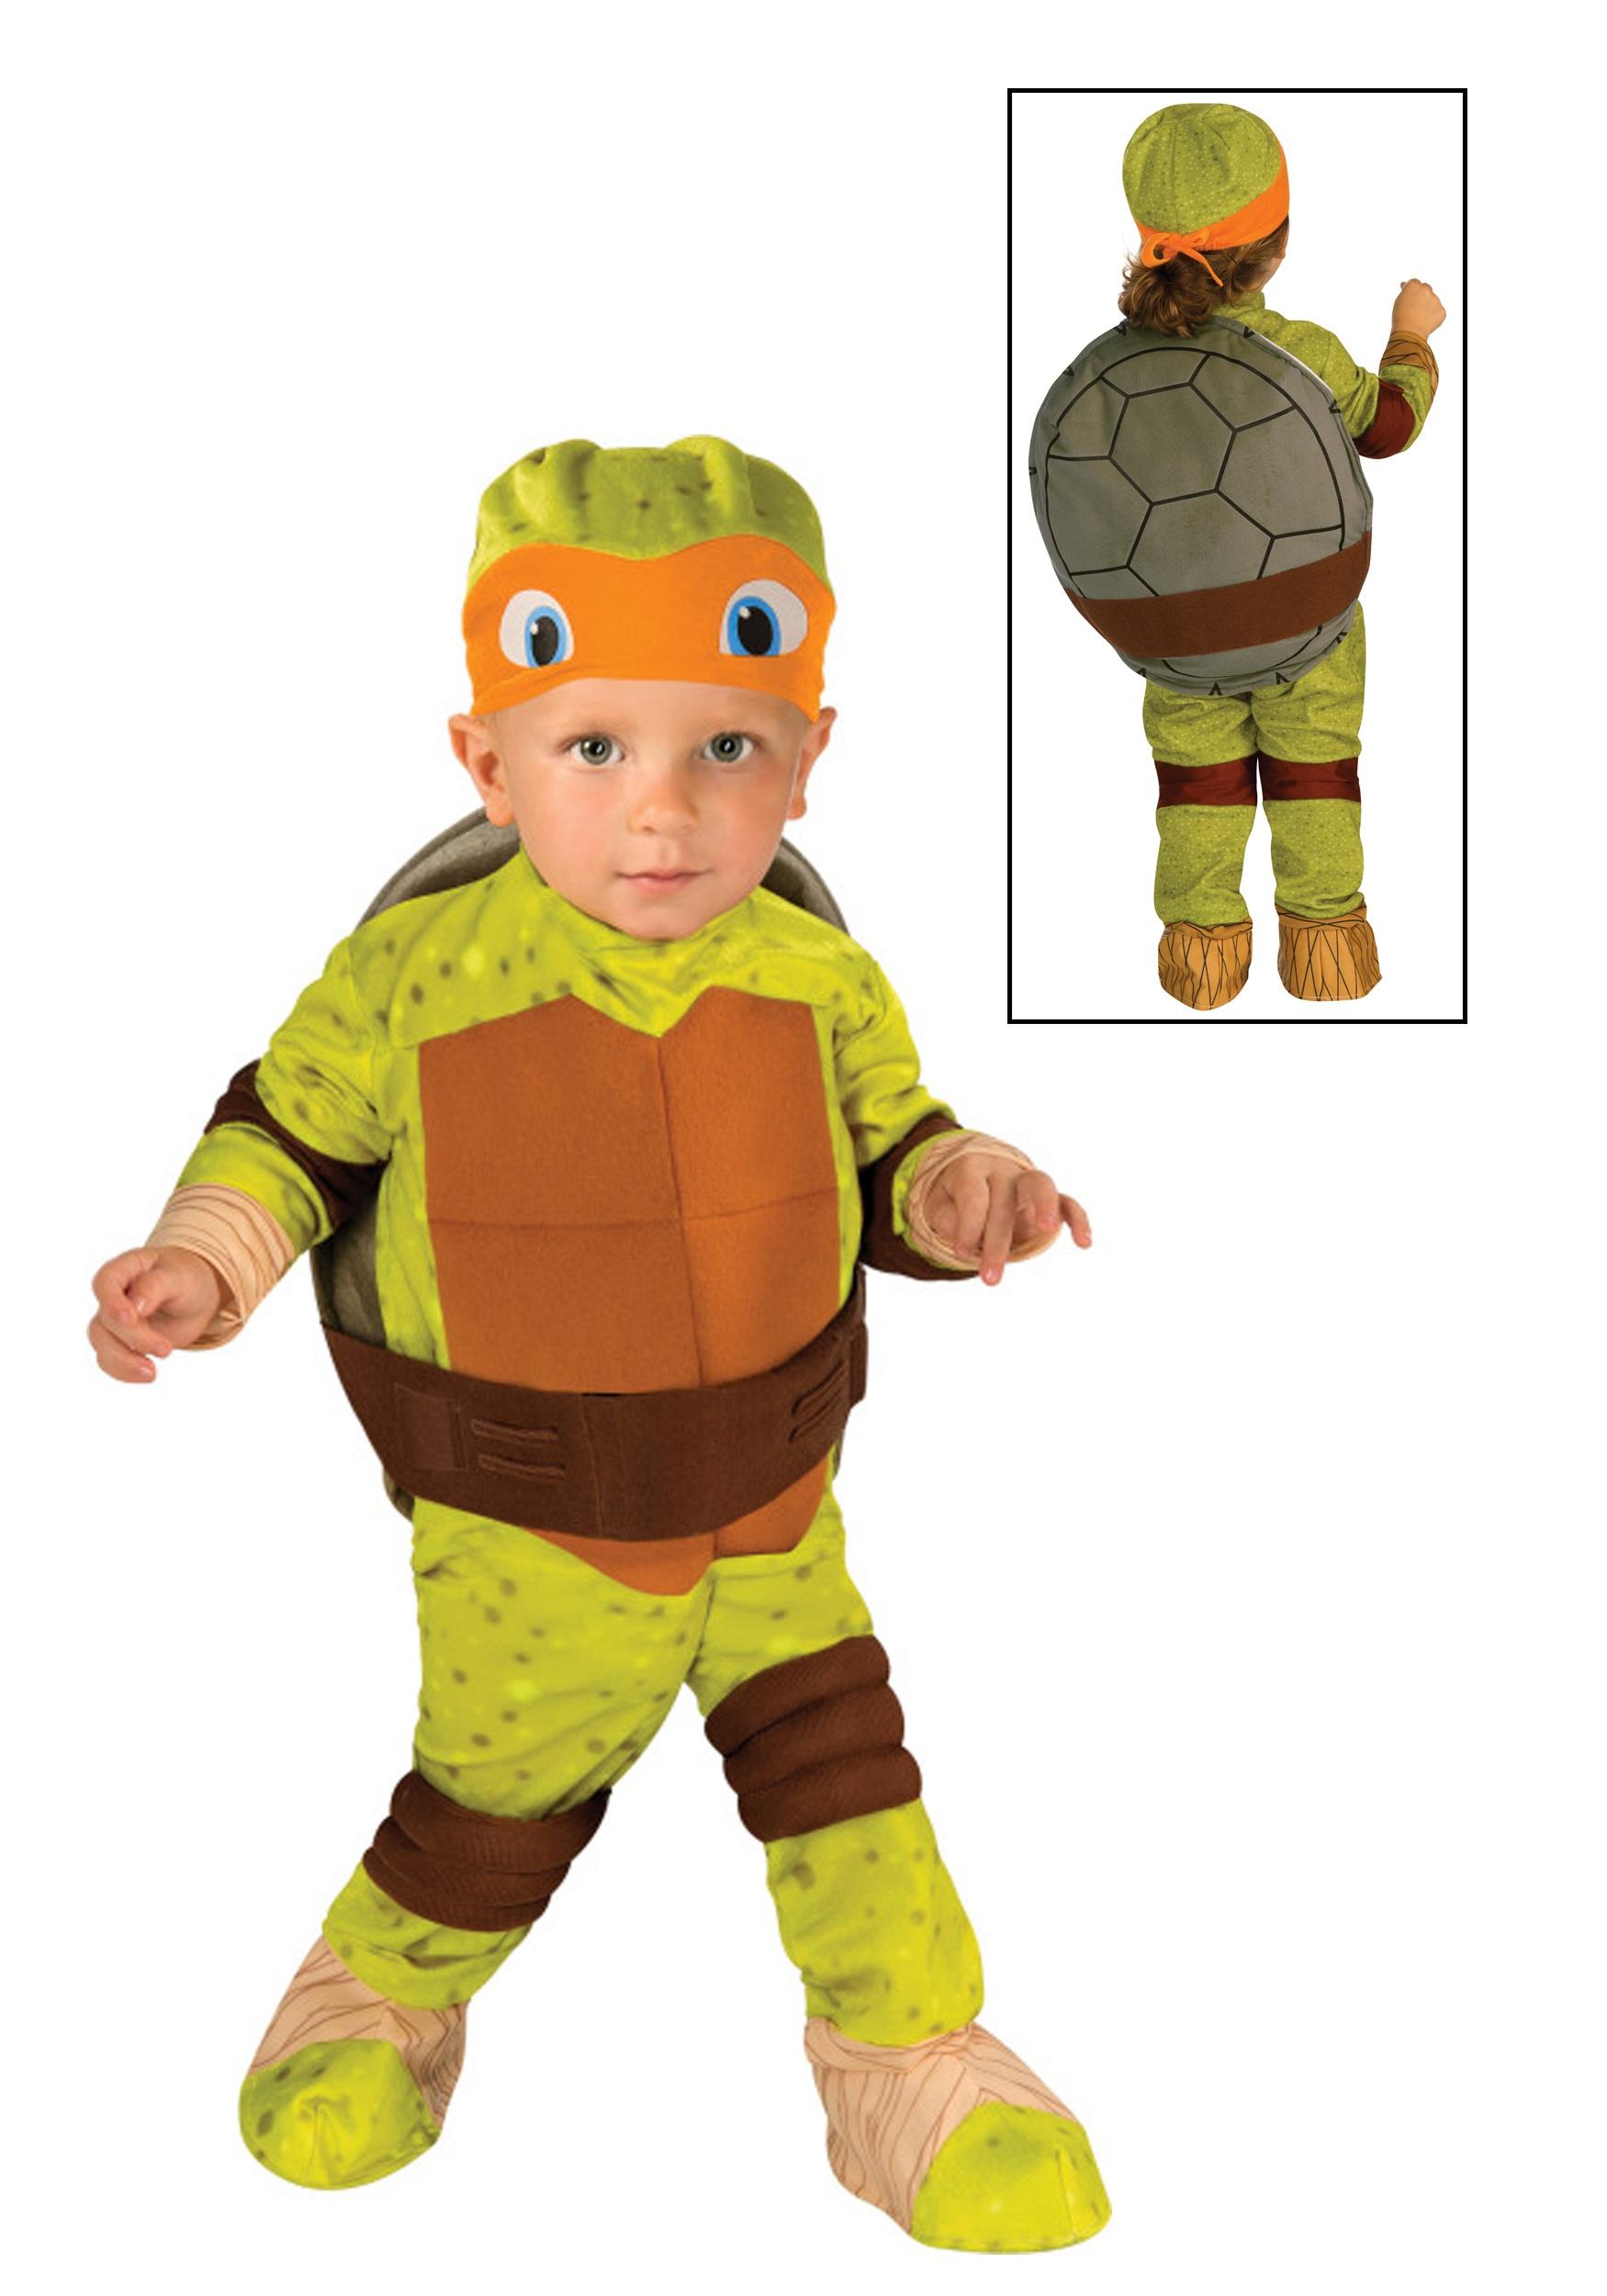 Buy New 24 99  Ninja Turtles Costumes Baby